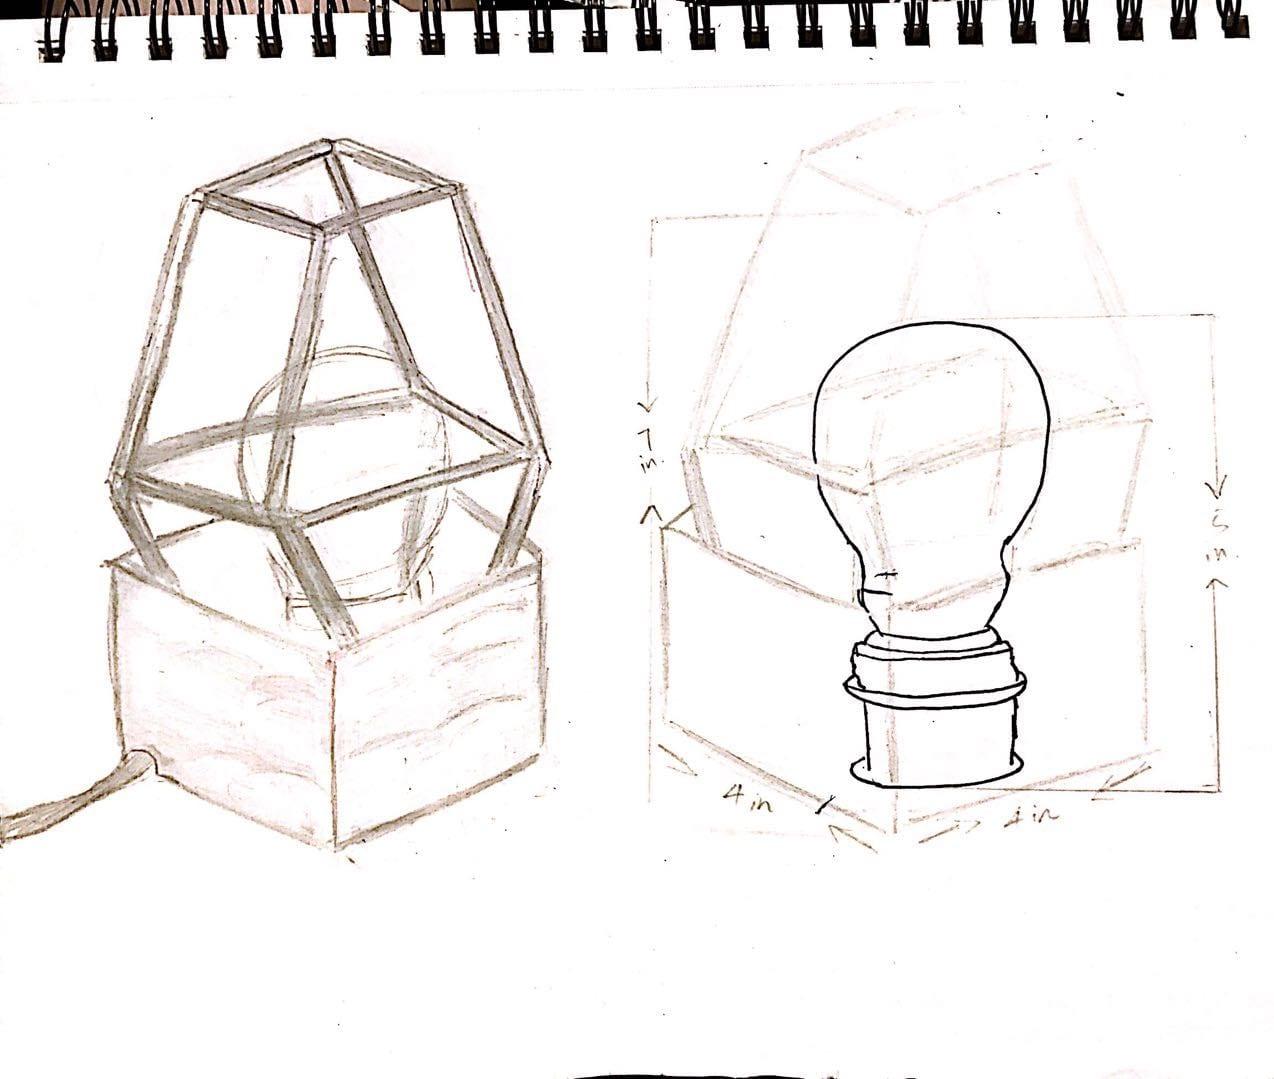 Design Idea #2